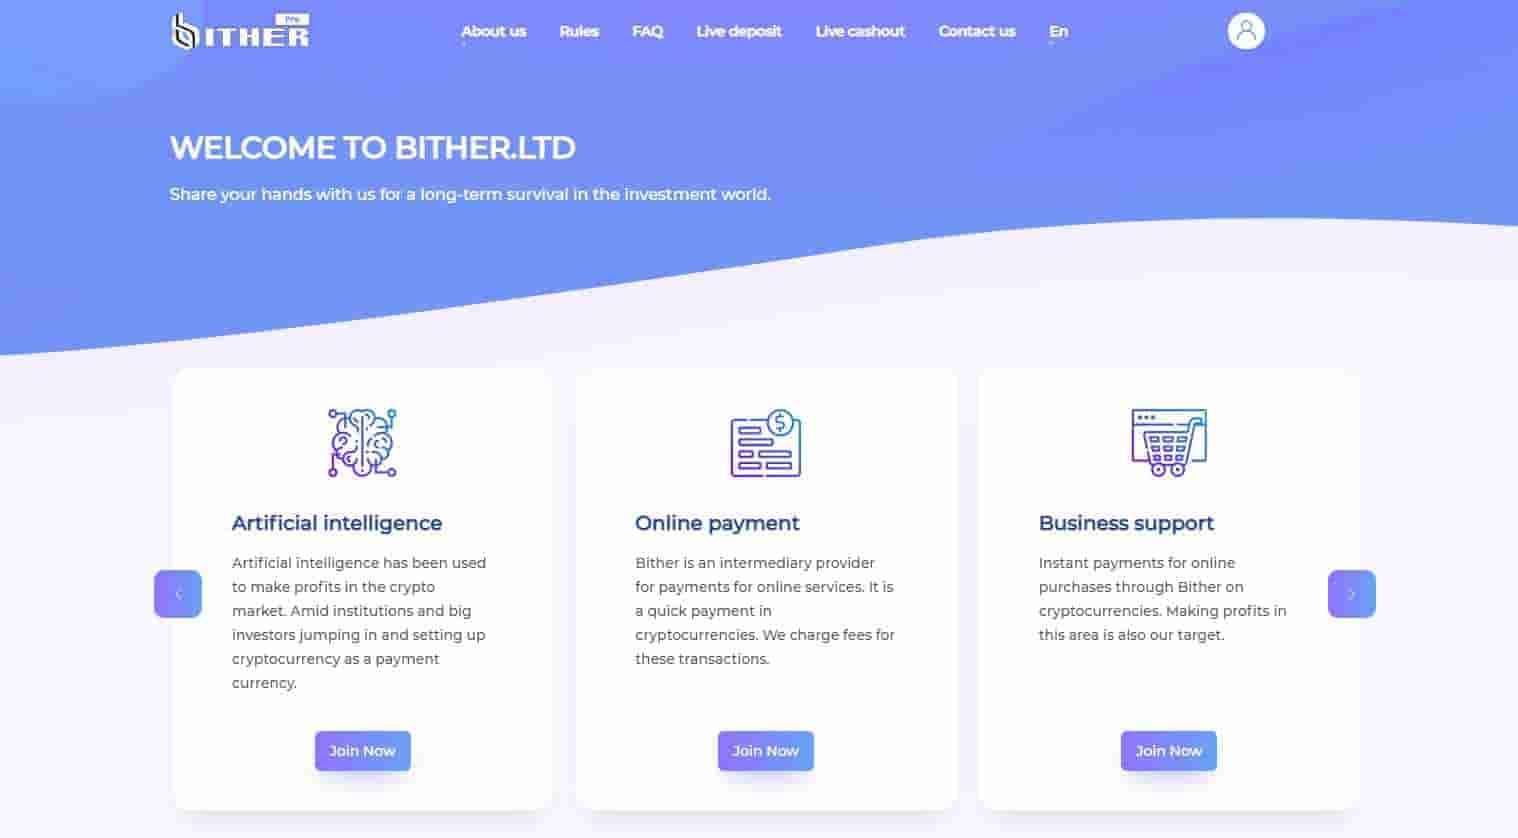 Bither Ltd